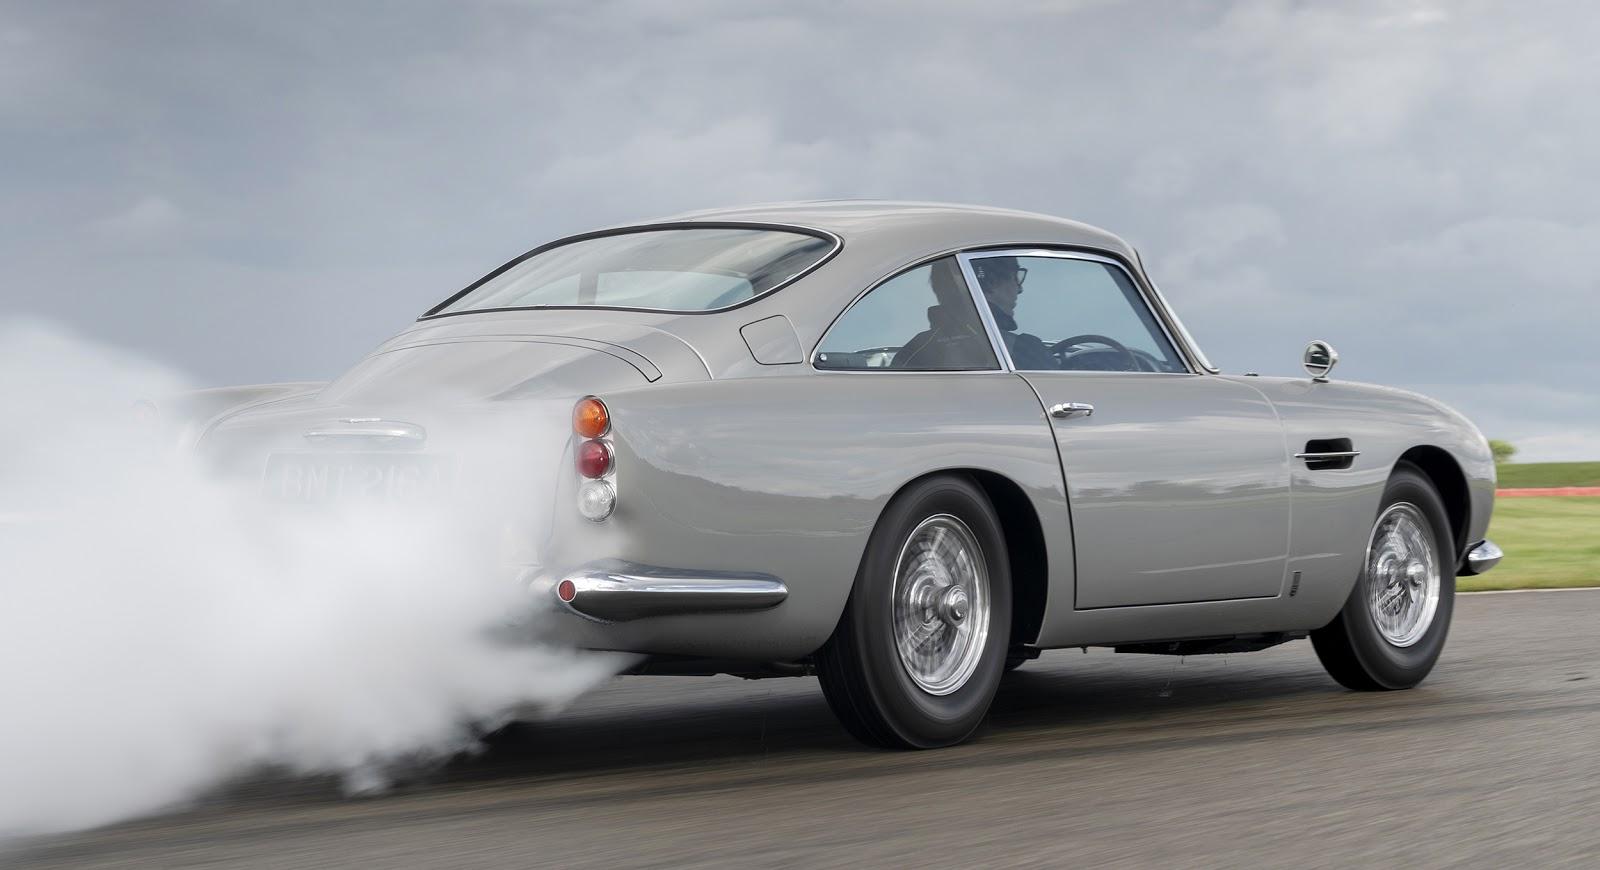 Aston Martin агента 007, который можно купить